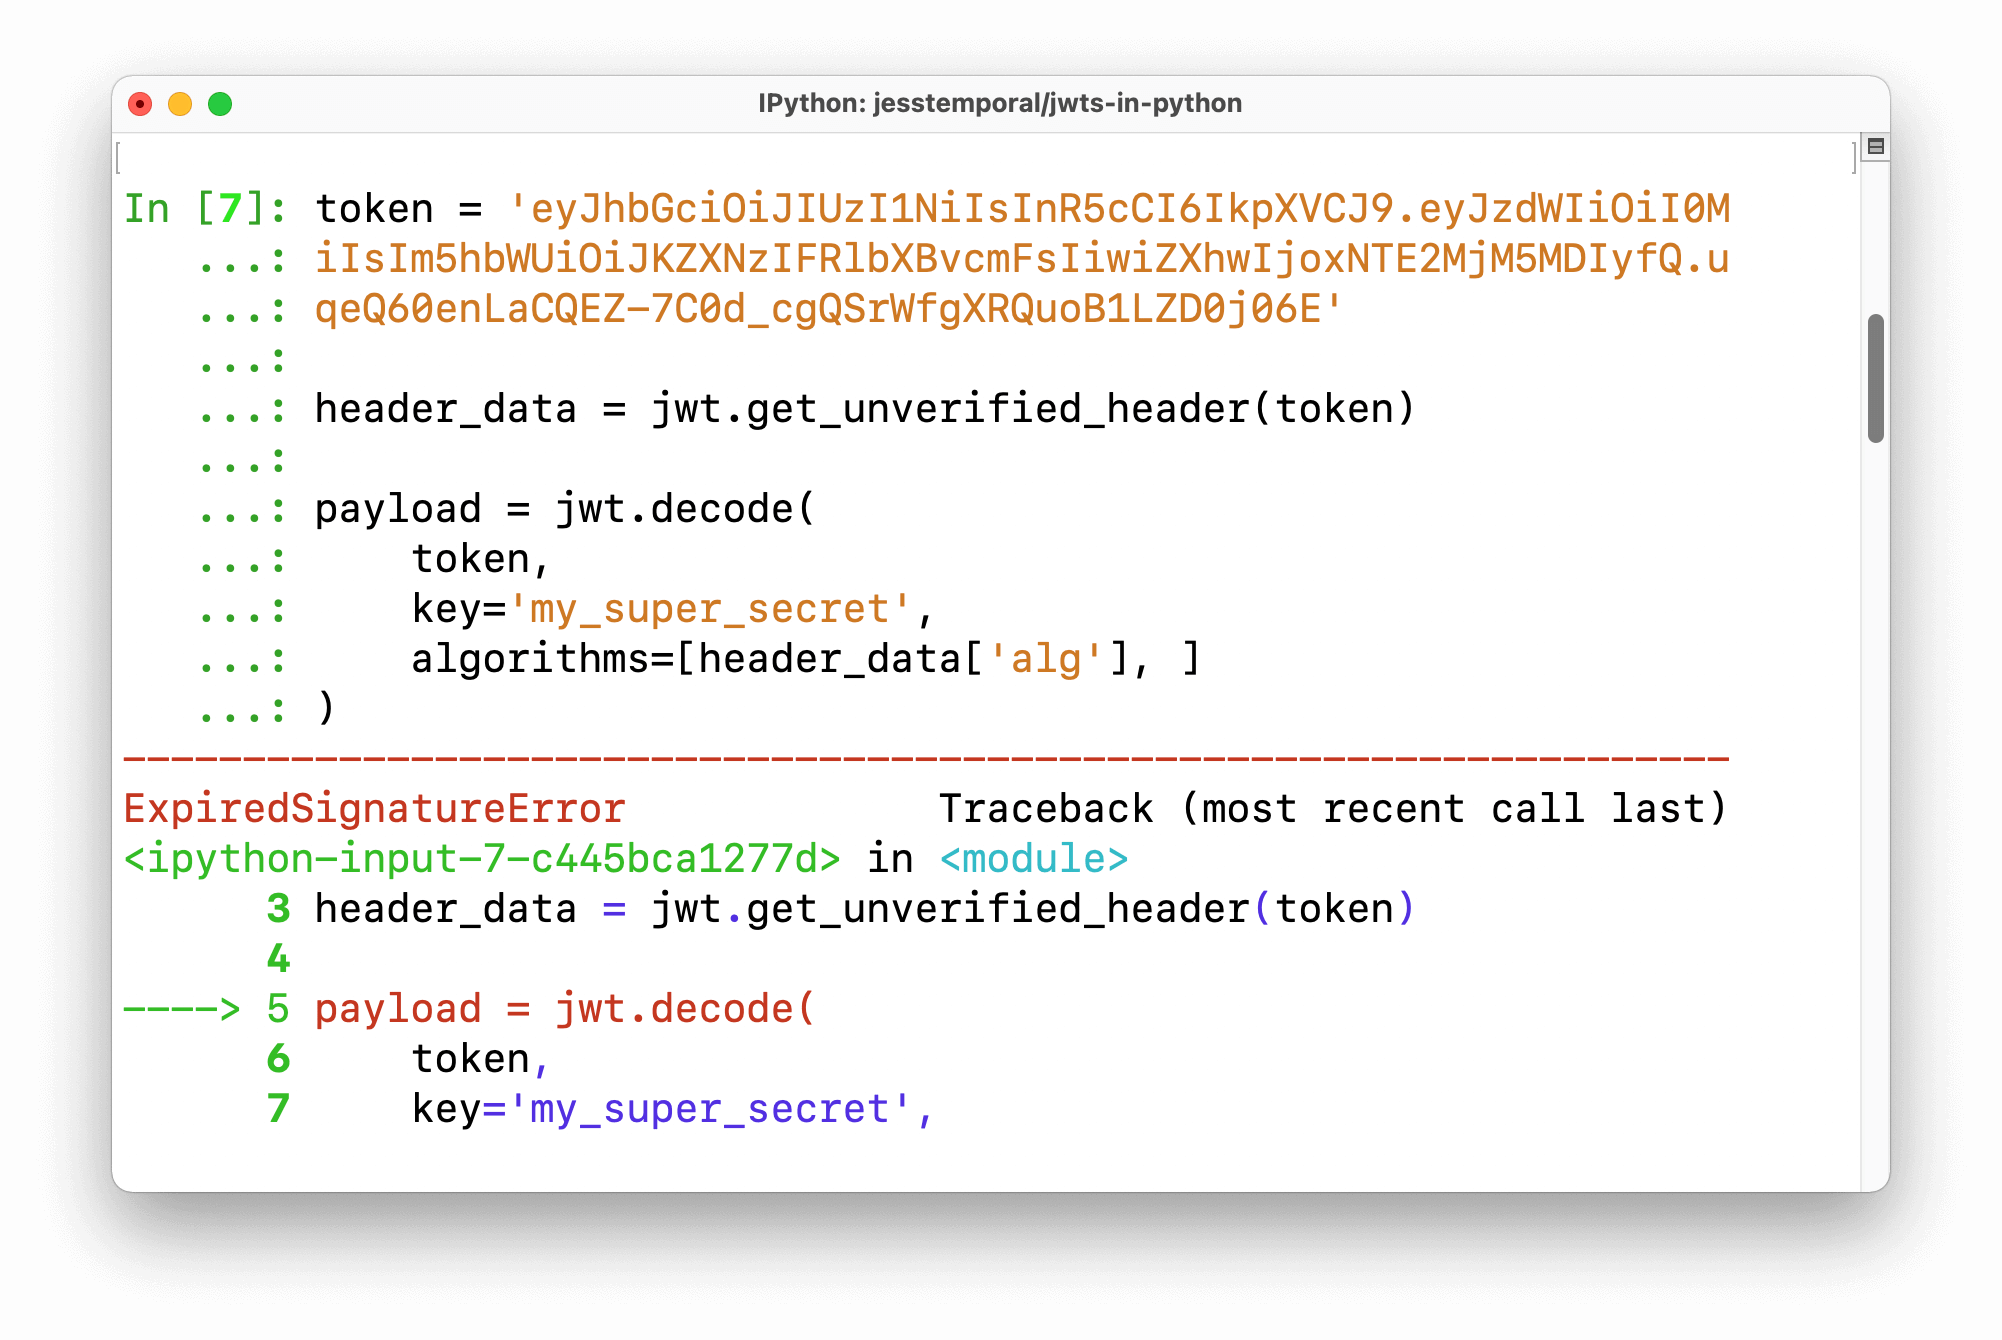 Screenshot of the error ExpiredSignatureError when trying to validate an expired token